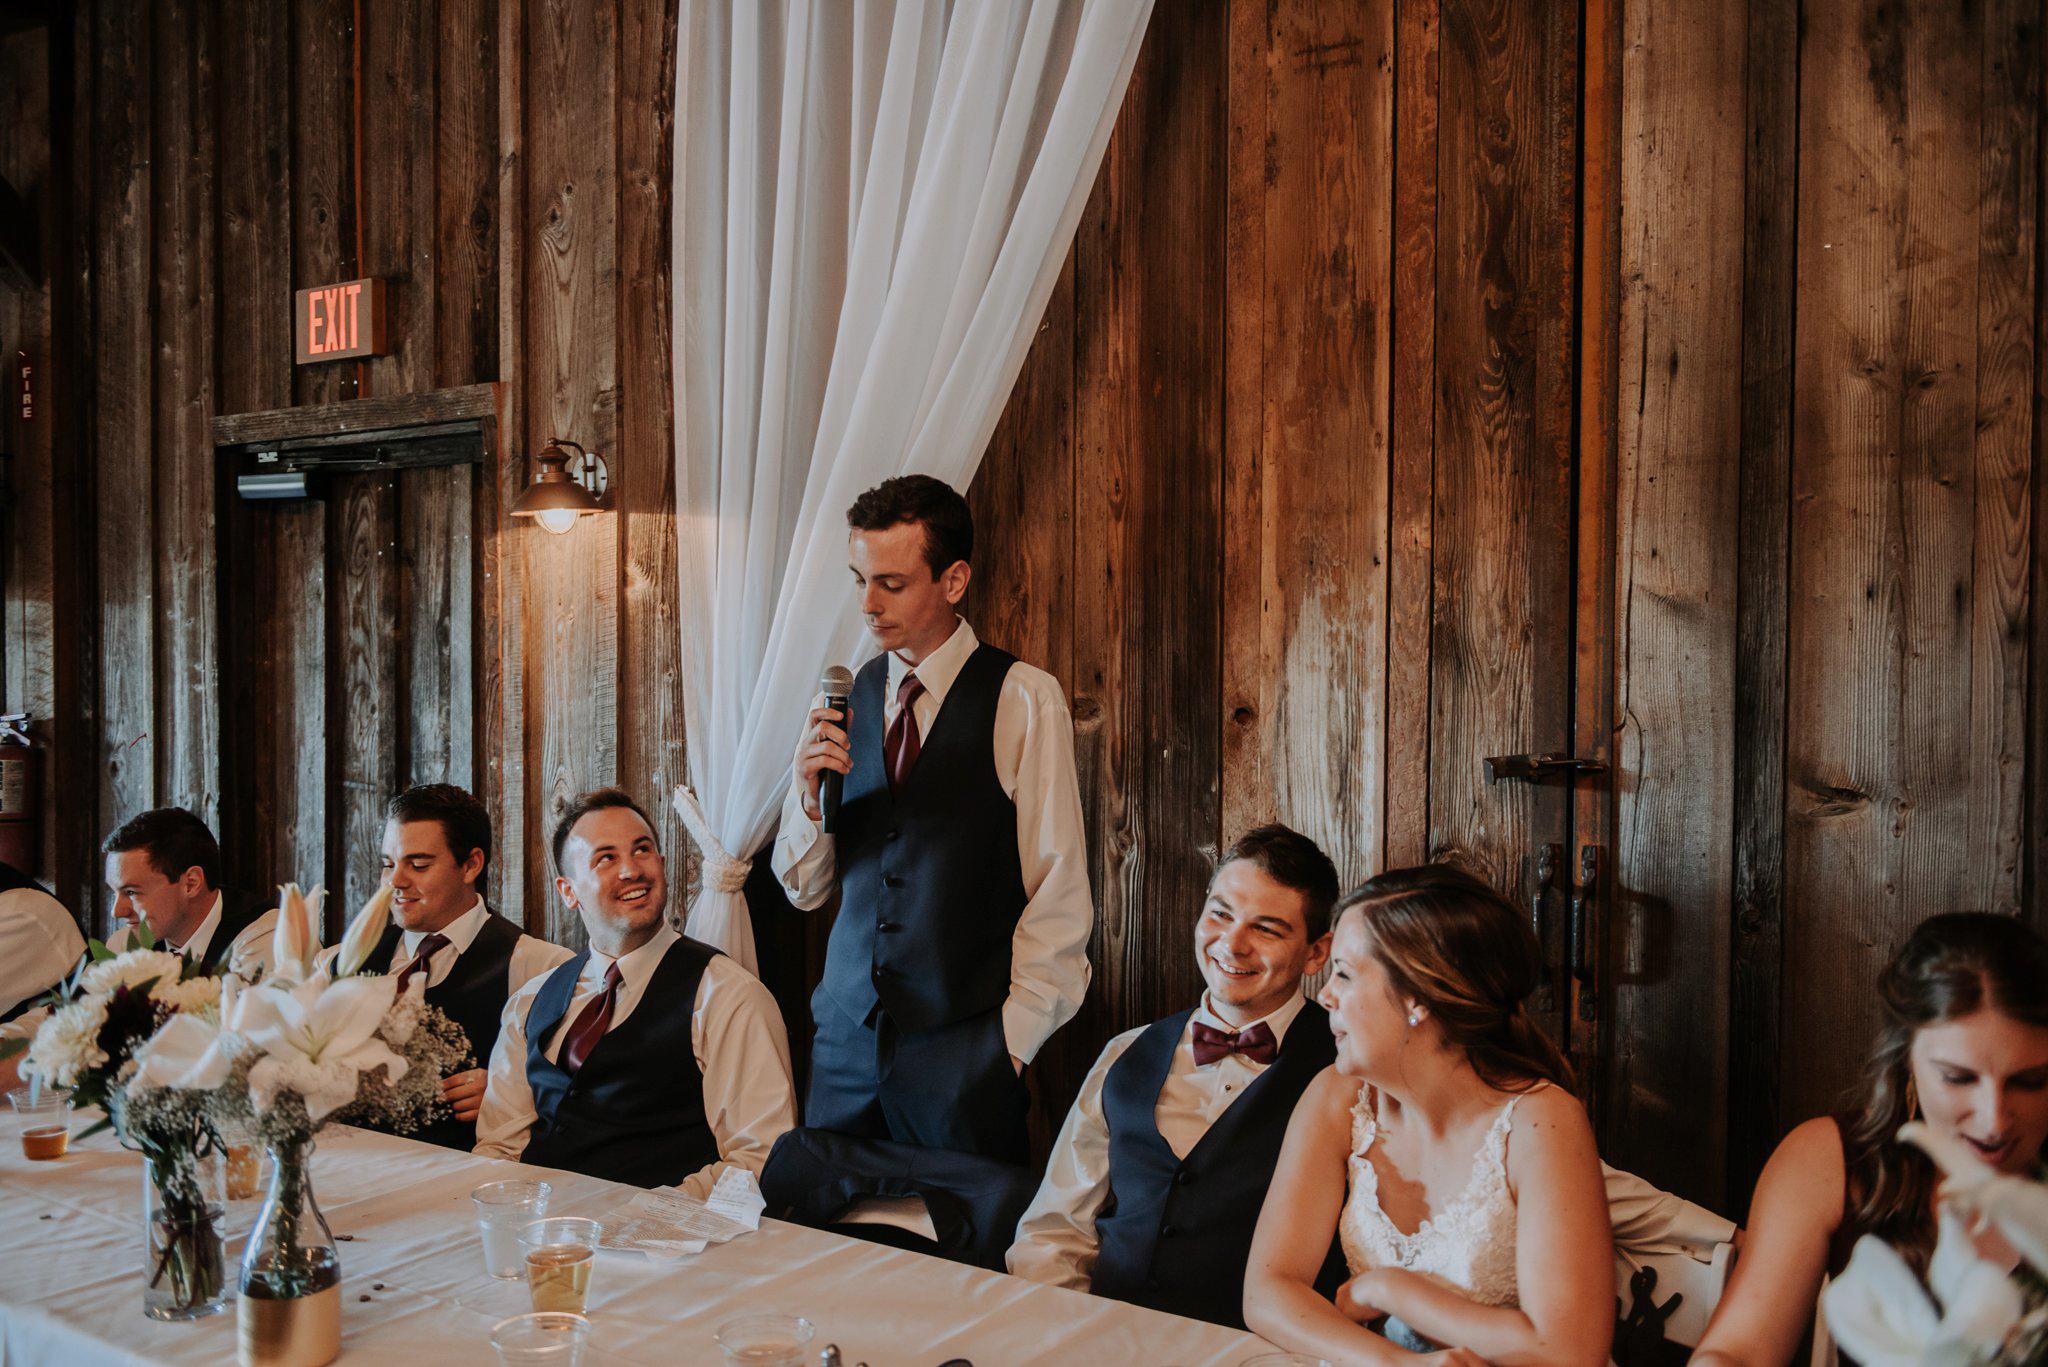 kristen-and-cody-the-kelley-farm-wedding-seattle-photographer-caitlyn-nikula-79.jpg